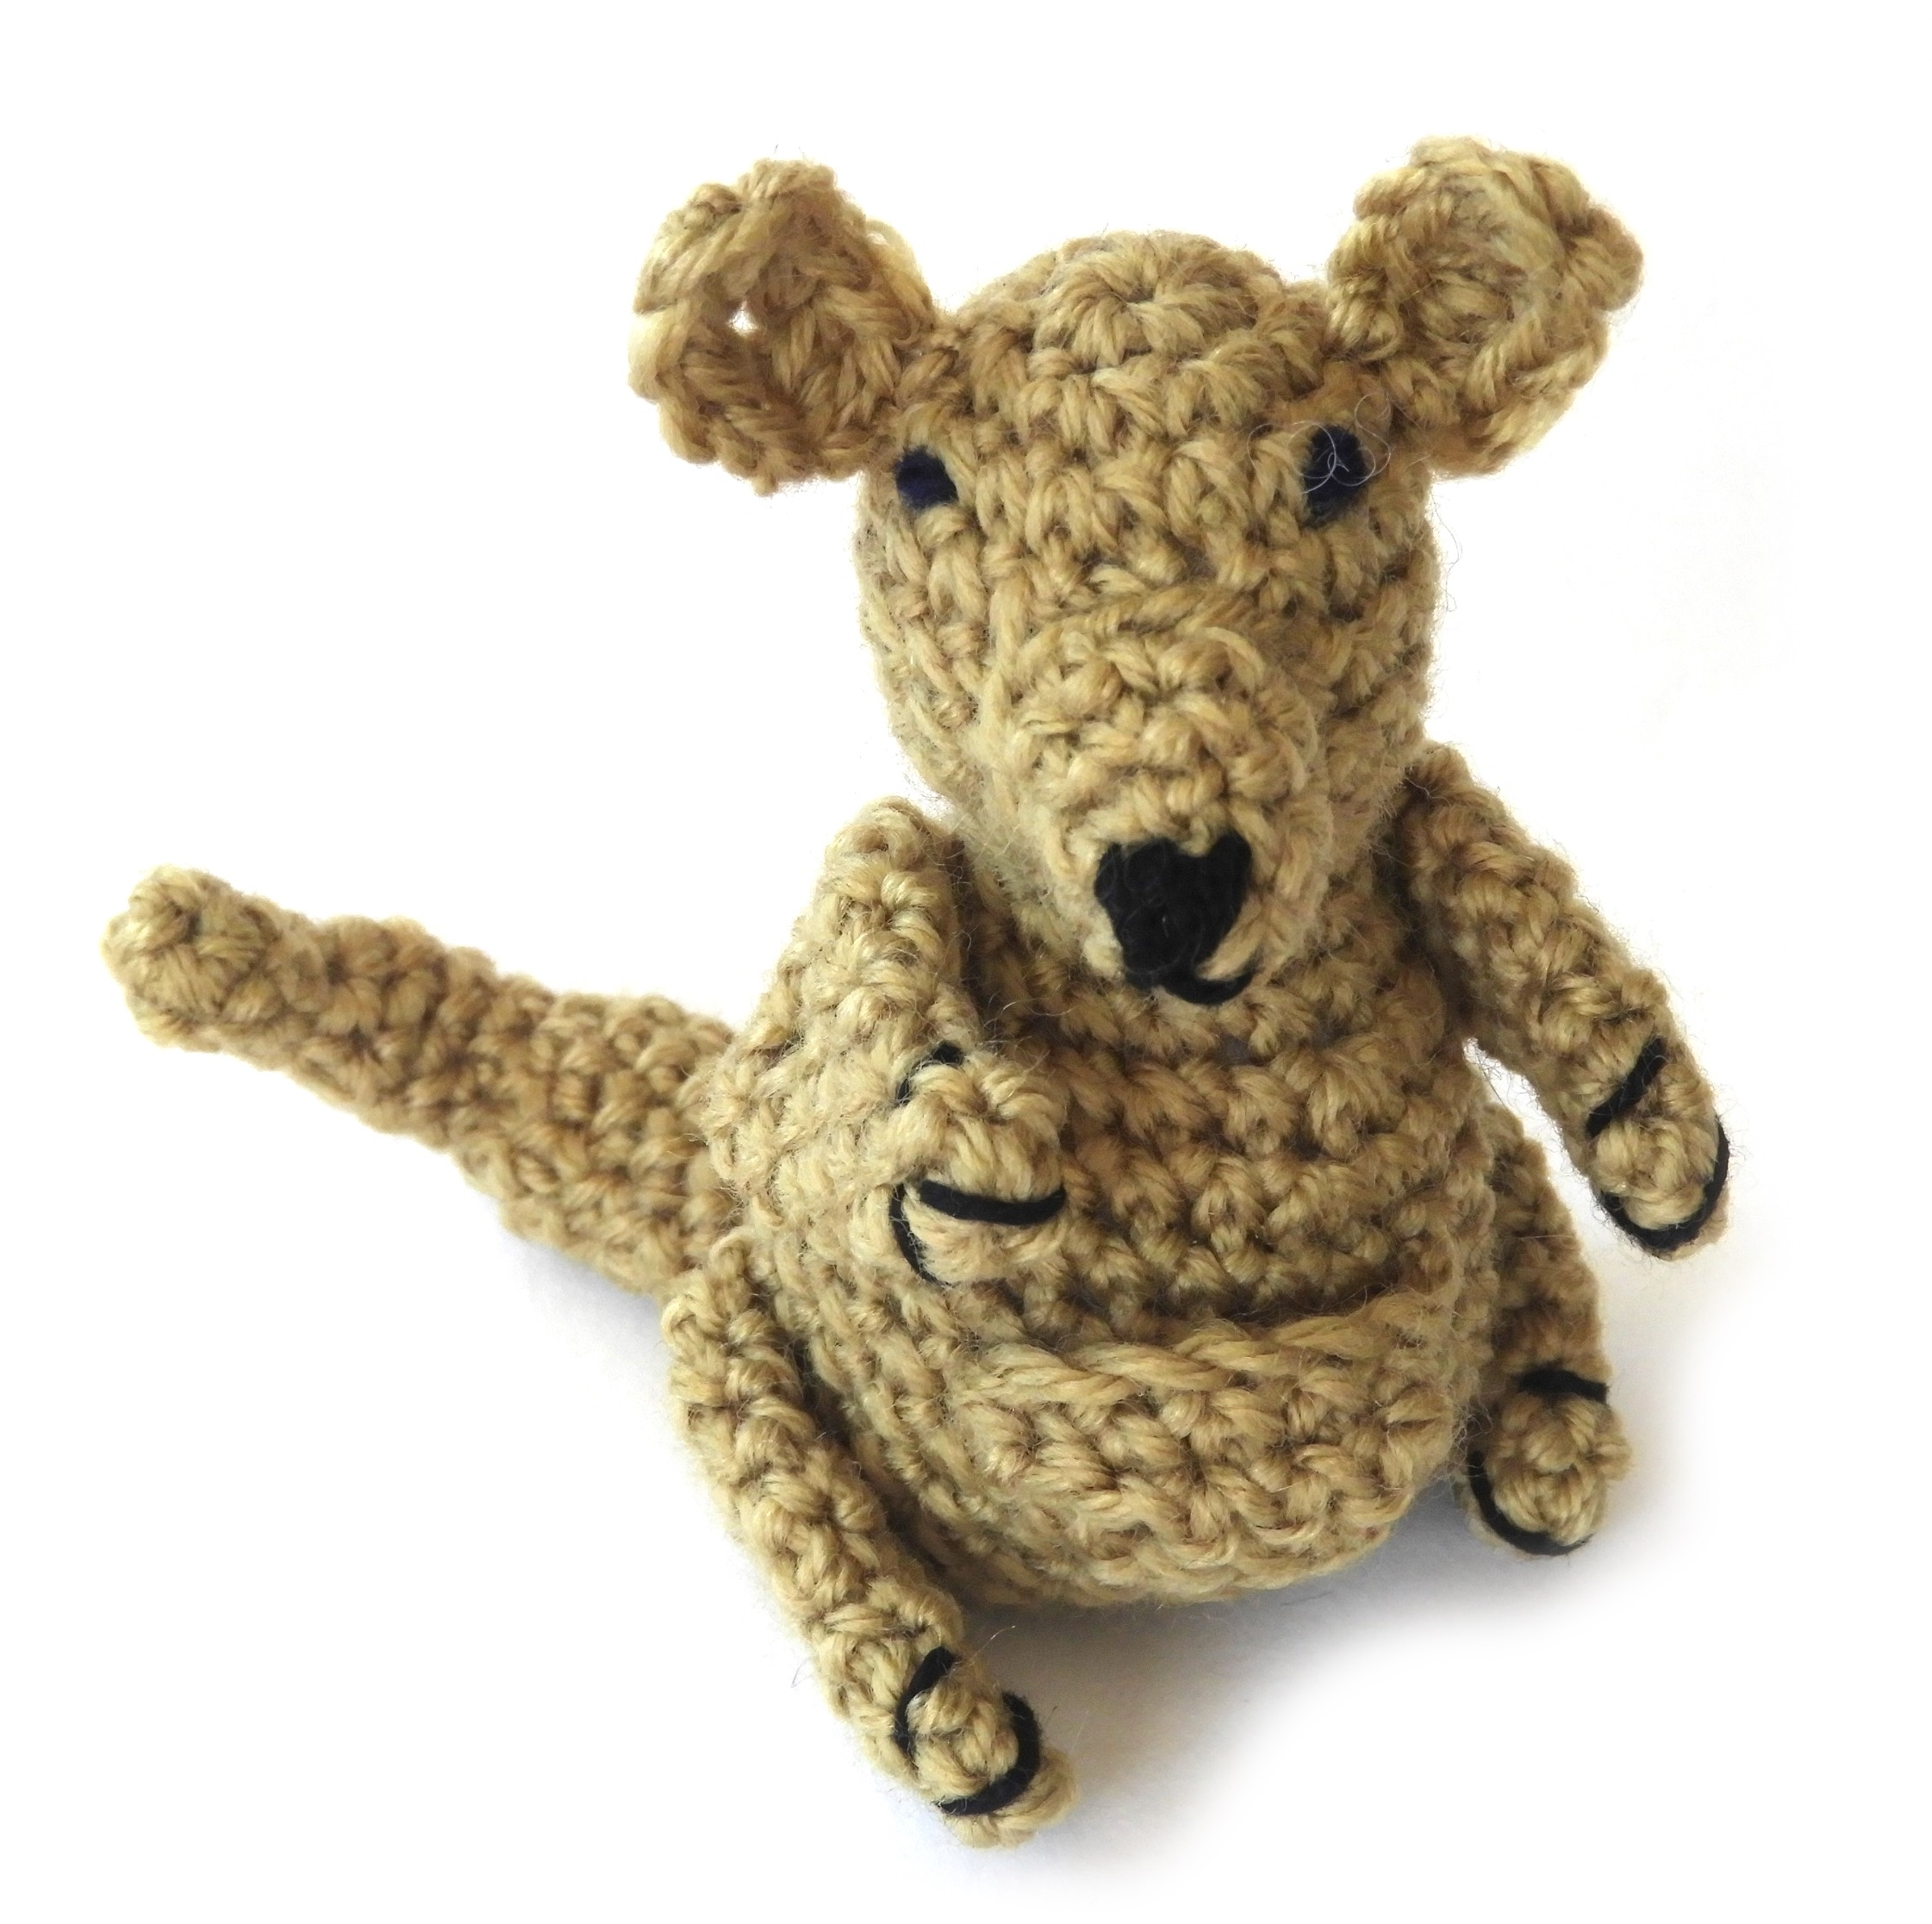 Kangaroo Amigurumi with Free Crochet Pattern - Pattern Center | 2233x2242